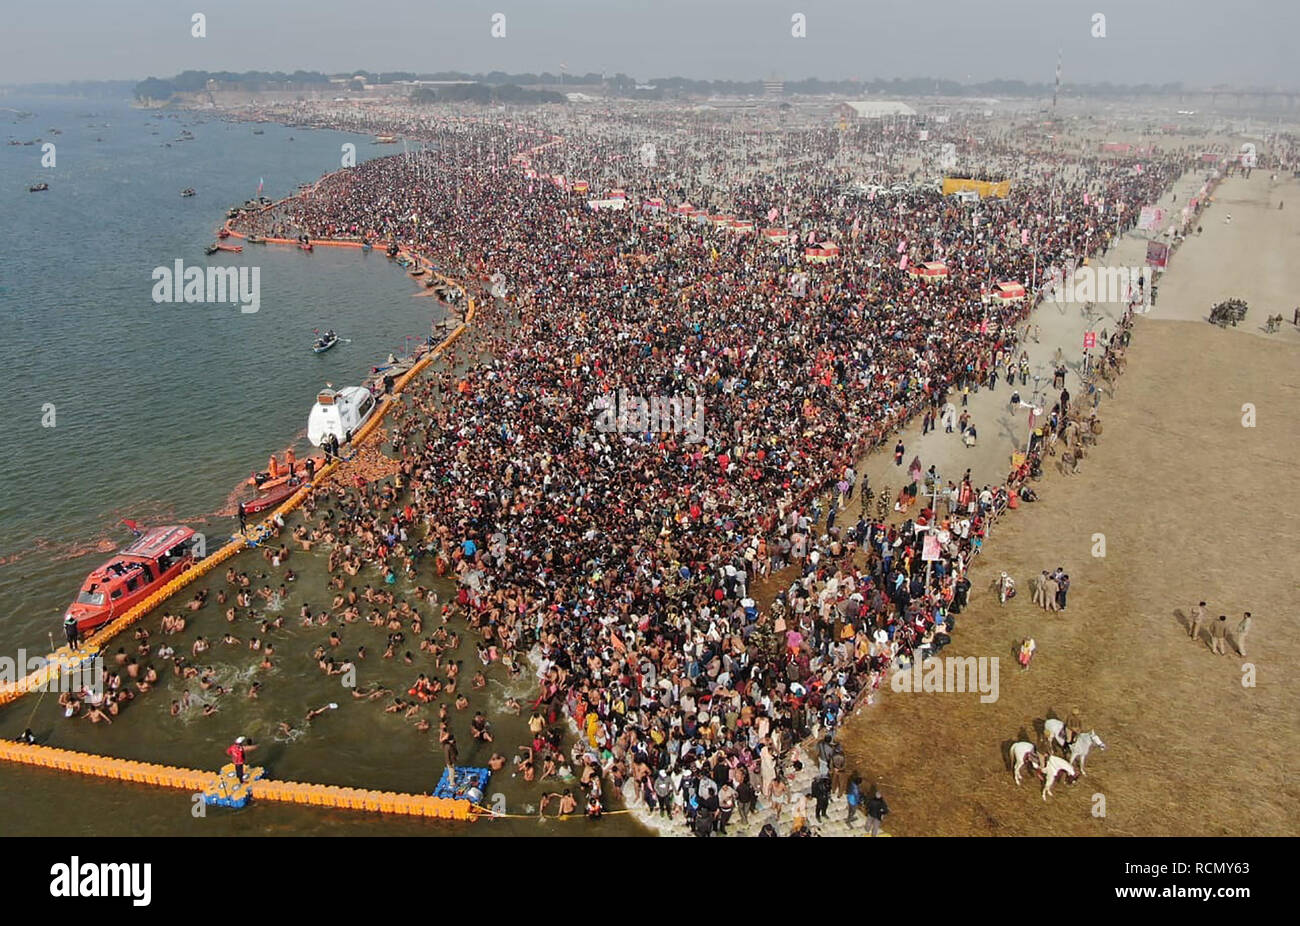 Allahabad, Uttar Pradesh, India. 15th Jan, 2019. Allahabad: A sea of devotees gathered to take bath at Sangam on the occasion of Makar Sankranti, the first Shahi Snan, during Kumbh Mela 2019 in Allahabad (Prayagraj), Tuesday, Jan 15, 2019. Credit: Prabhat Kumar Verma/ZUMA Wire/Alamy Live News Stock Photo